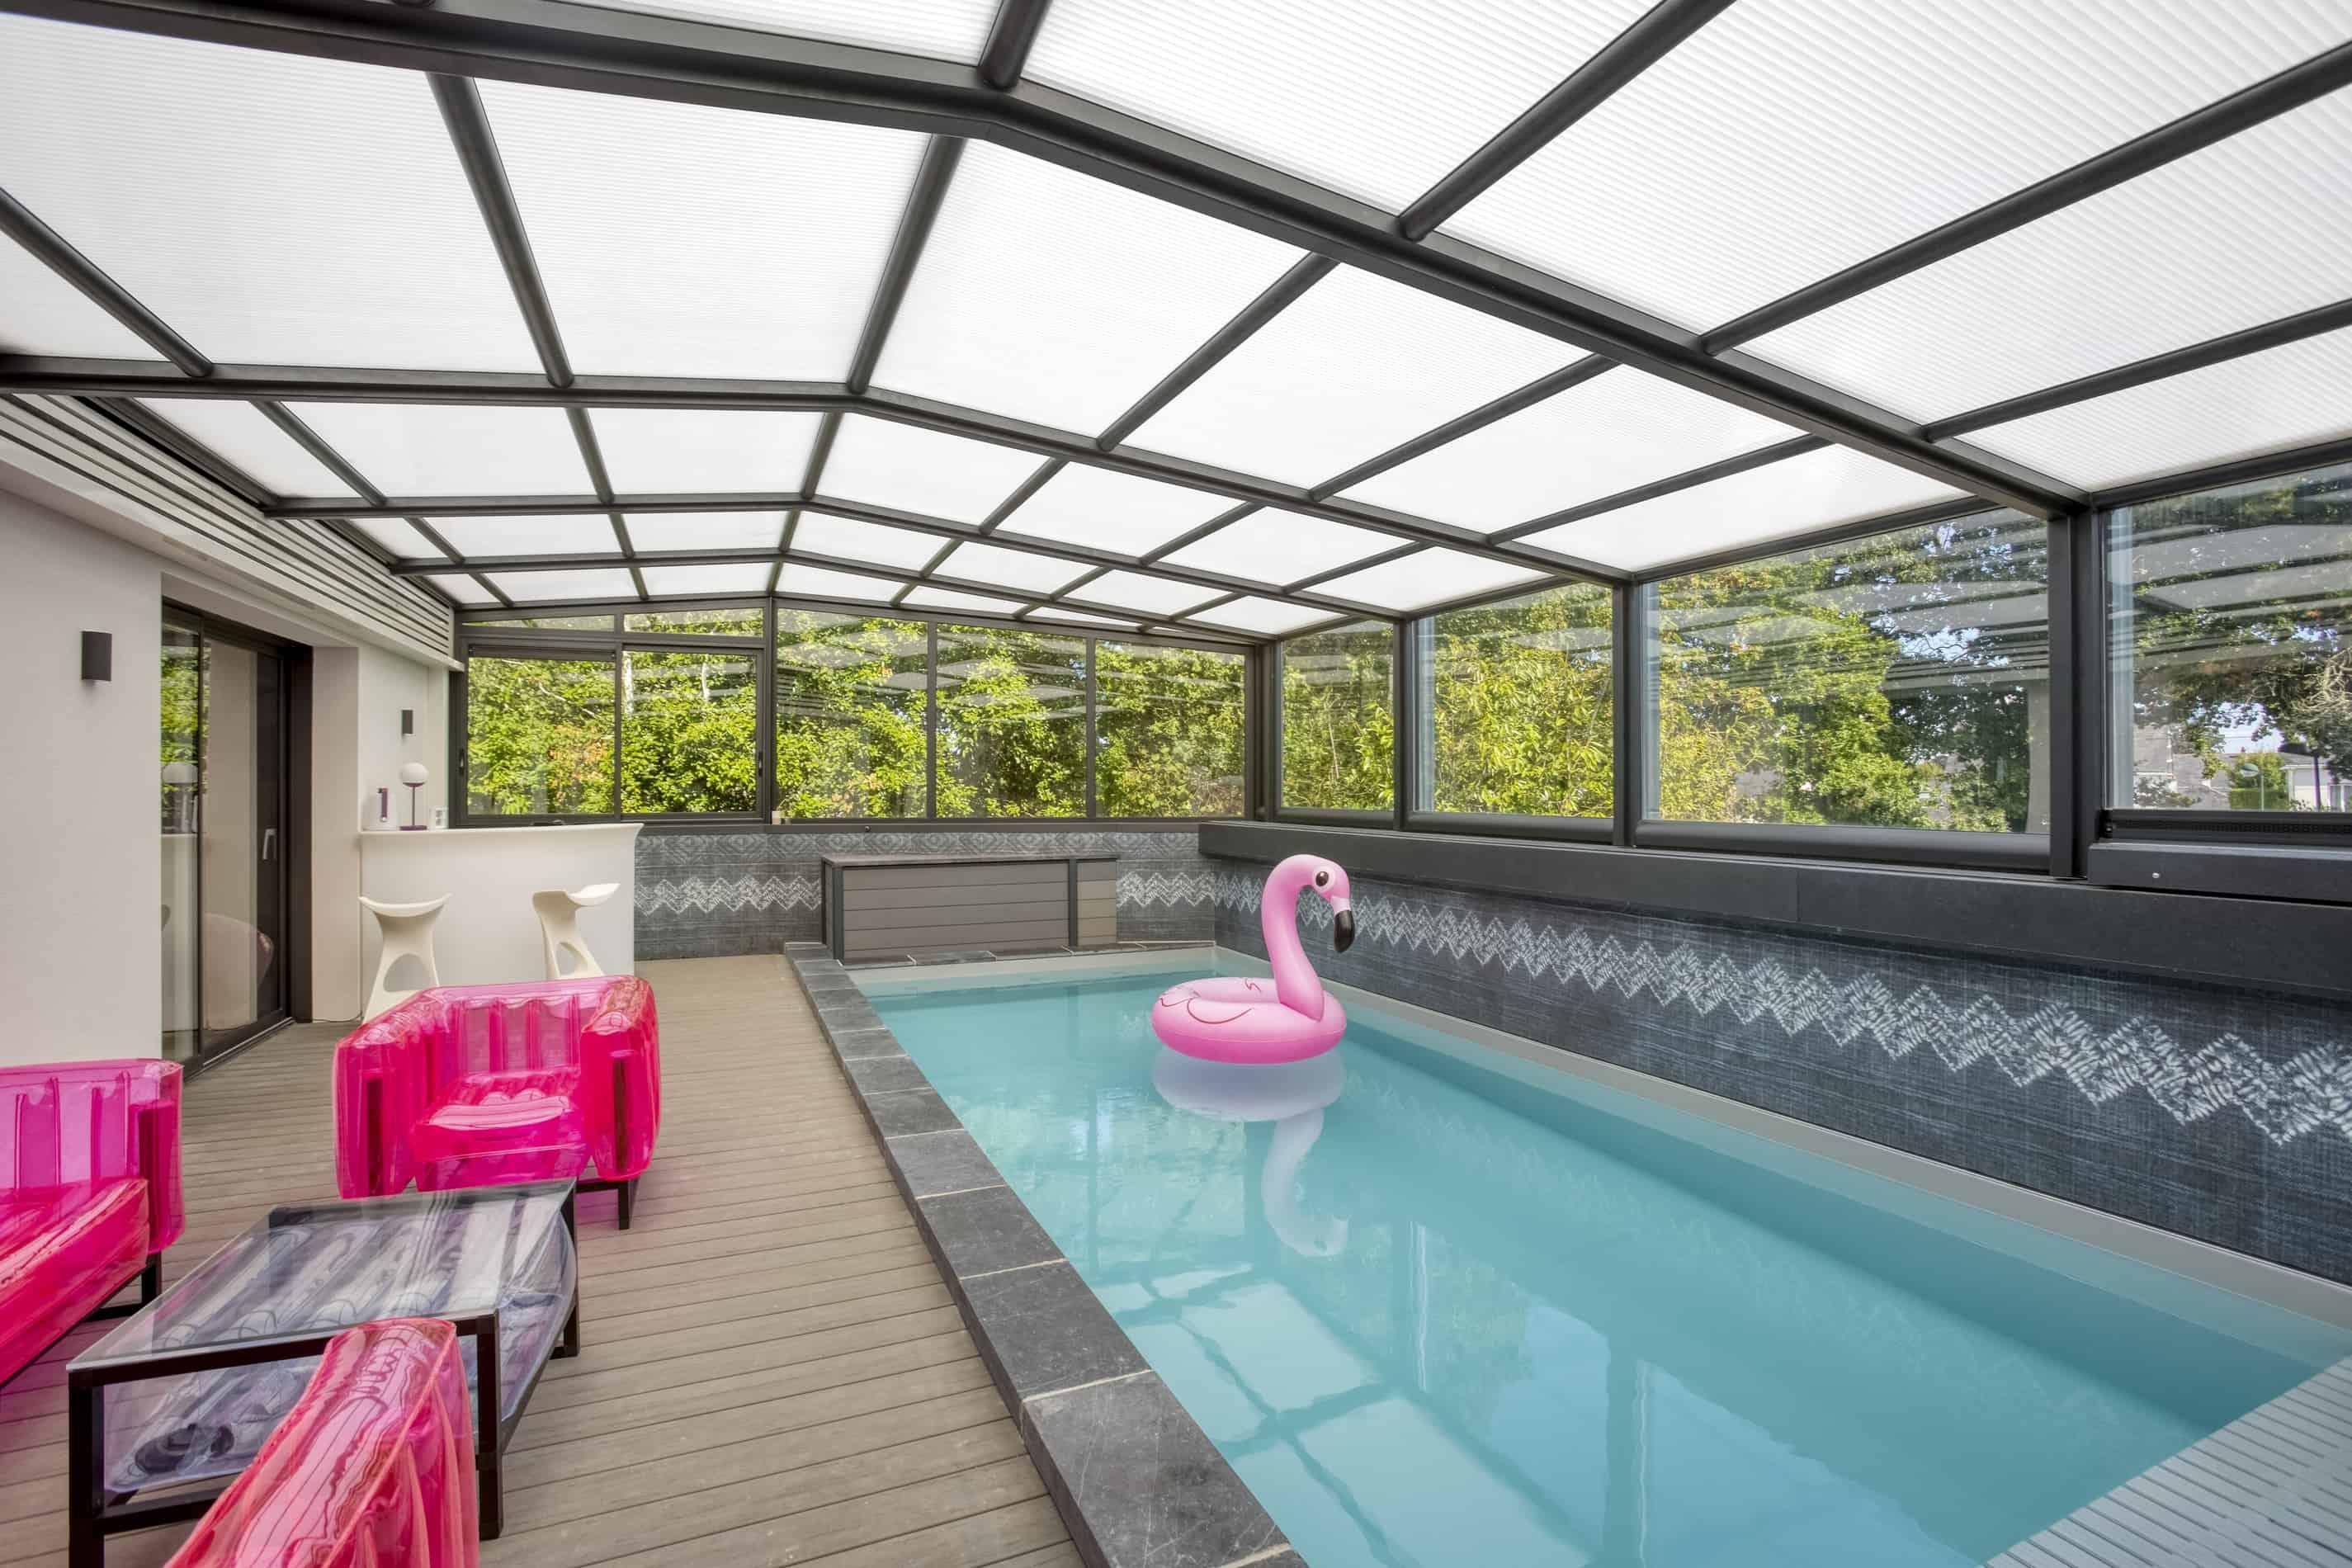 abri de piscine Verand'abris renoval aménagement déco